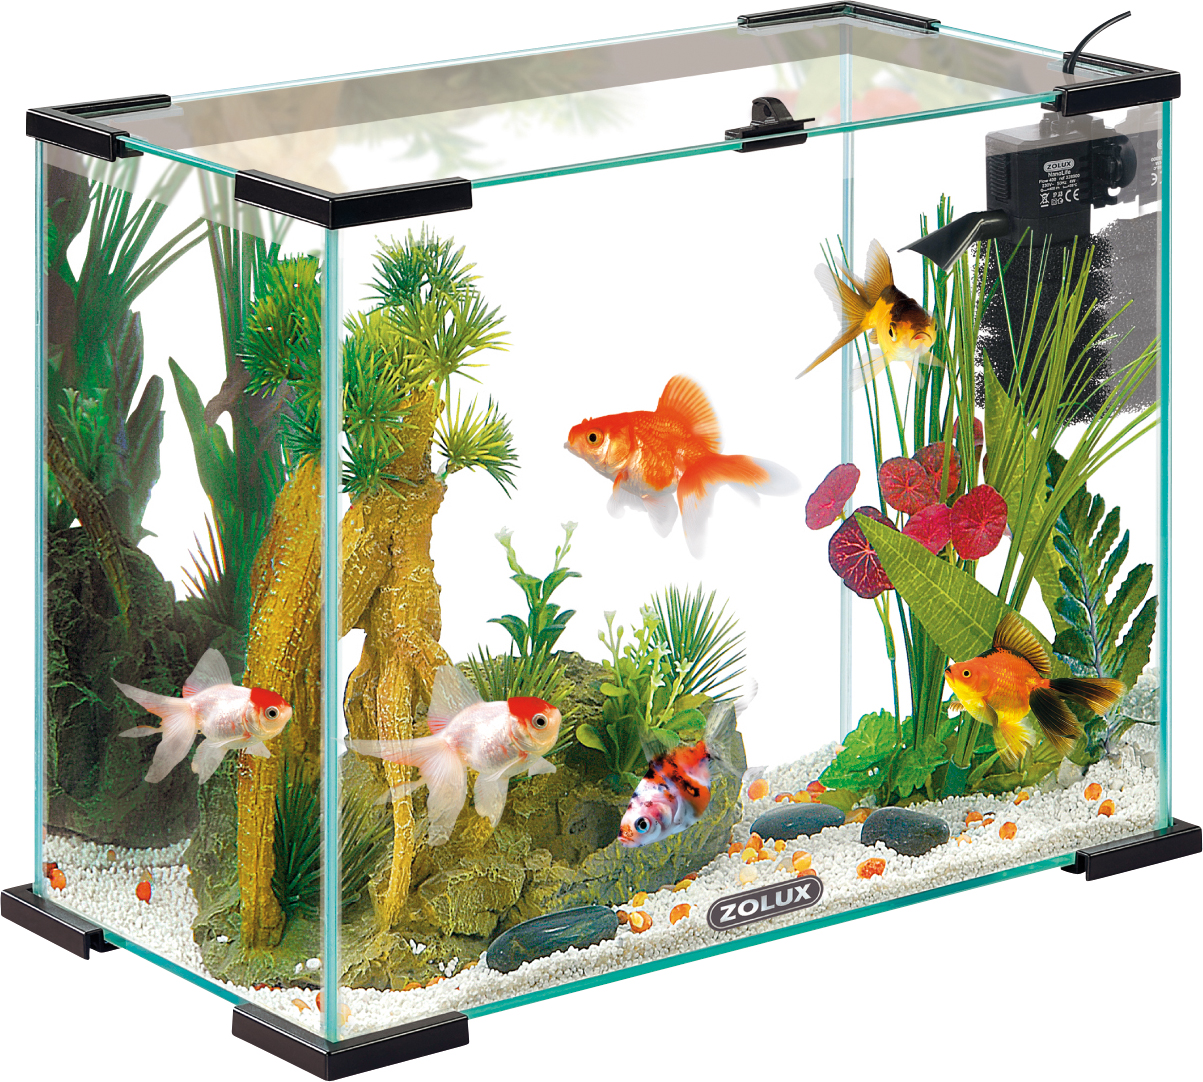 Nano aquarium zolux nanolife first 24 black volume 23 5l for Aquarium zolux